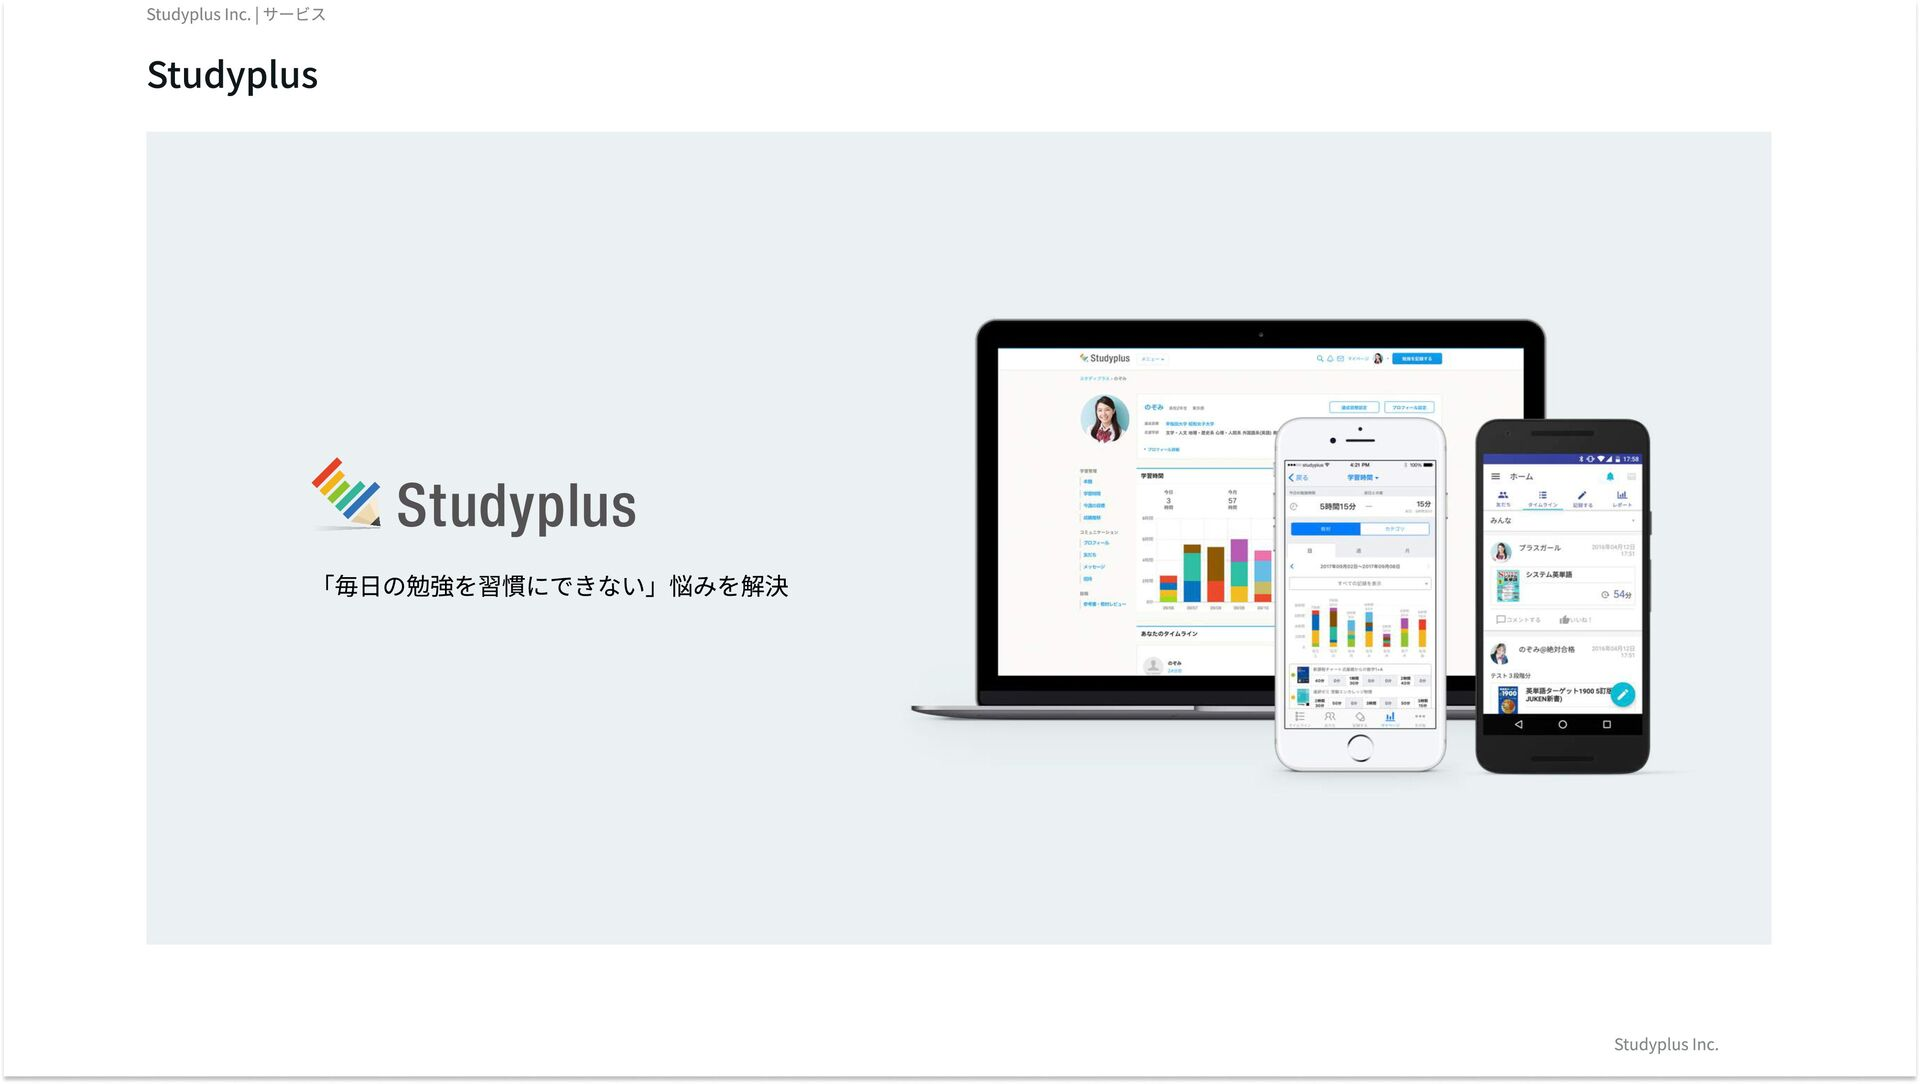 Studyplus 「毎日の勉強を習慣にできない」悩みを解決